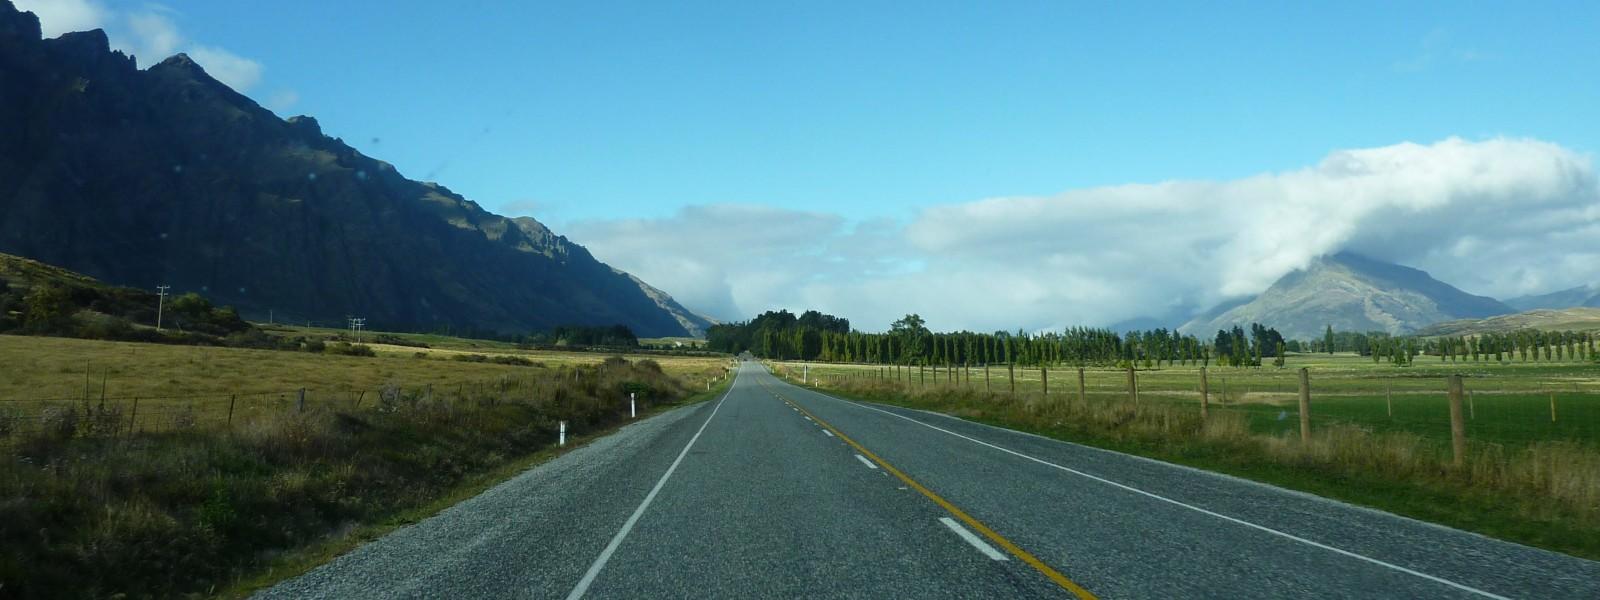 MountMcKinley-Tour-Guide